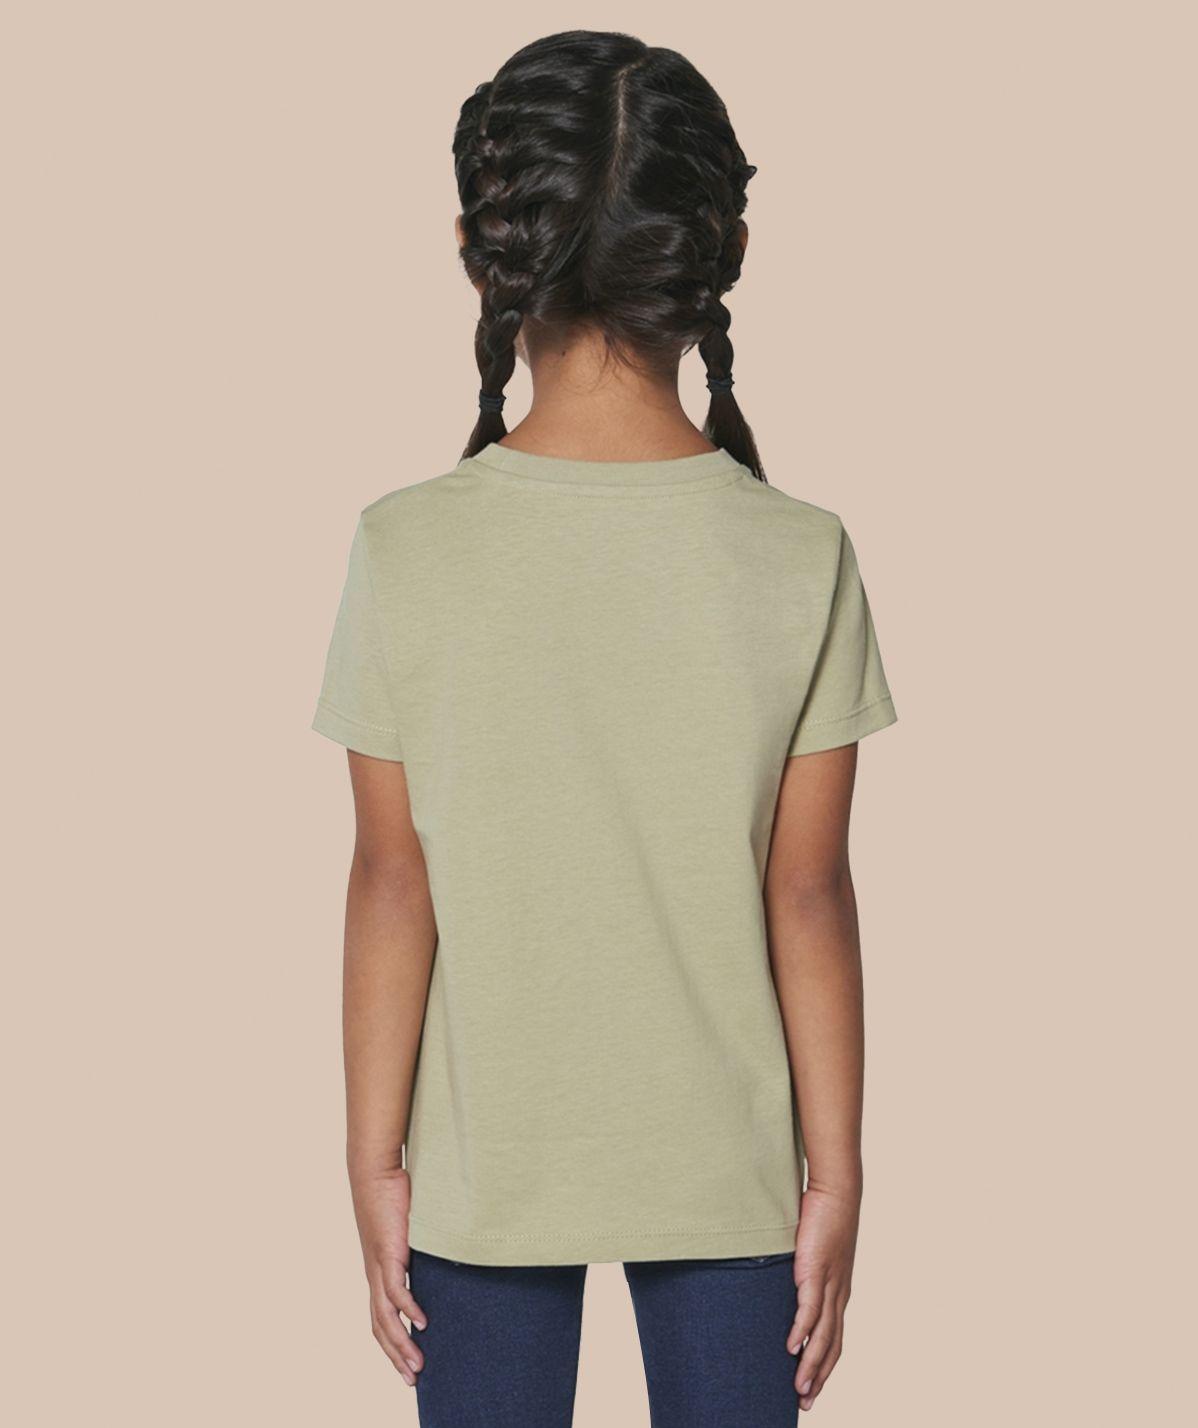 T-shirt Enfant Fitness - Stone